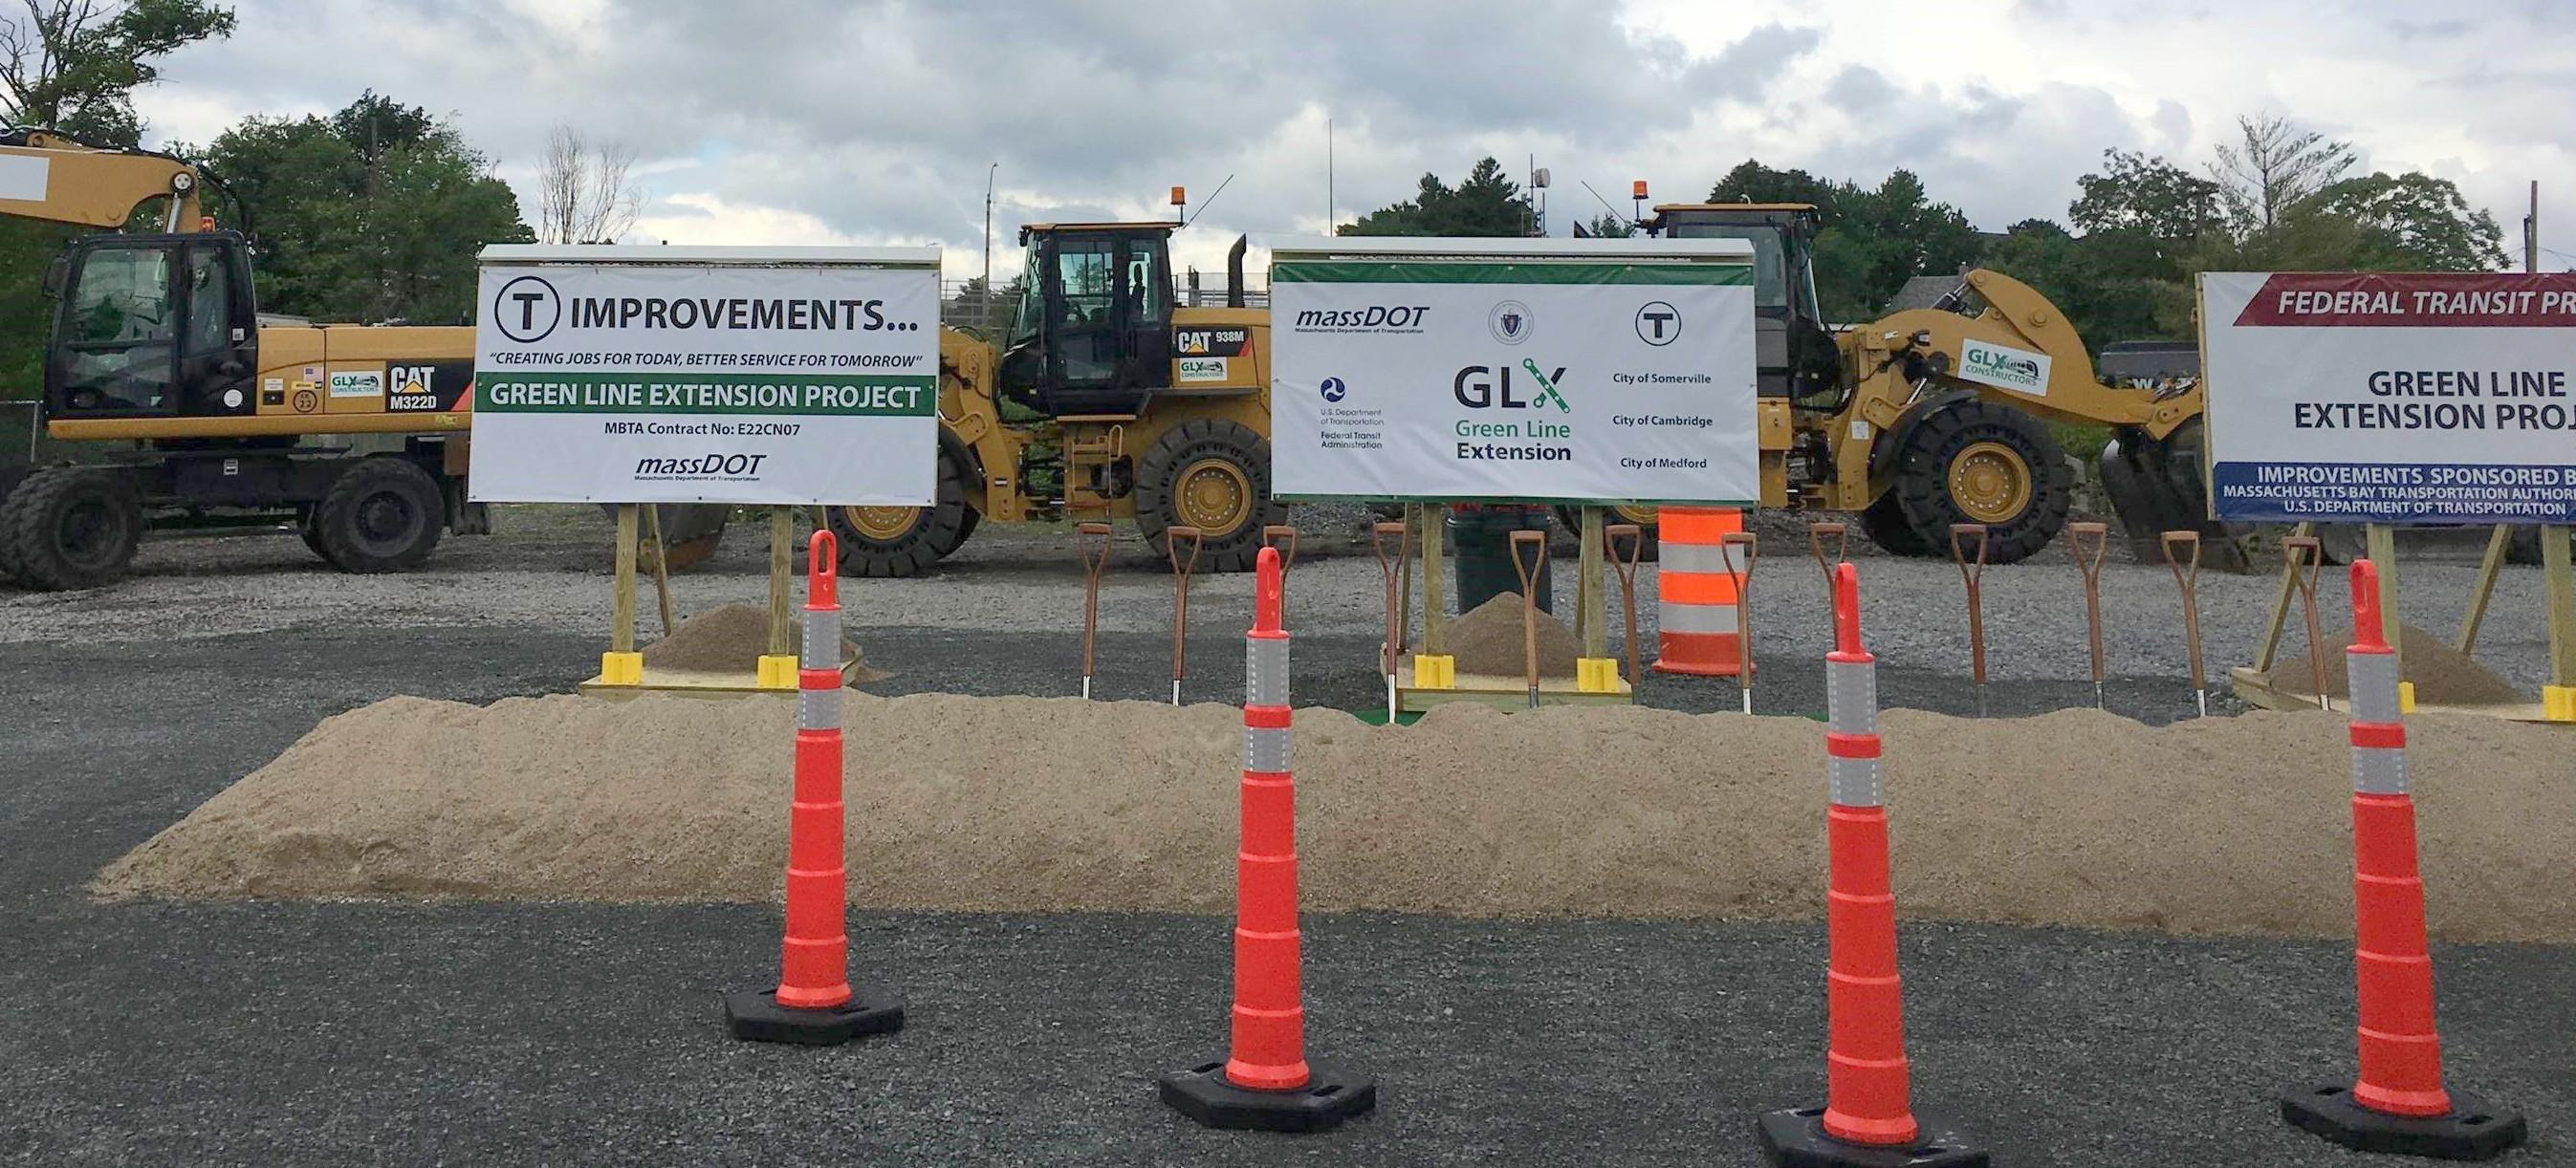 MBTA Boston Green Line Extension groundbreaking site